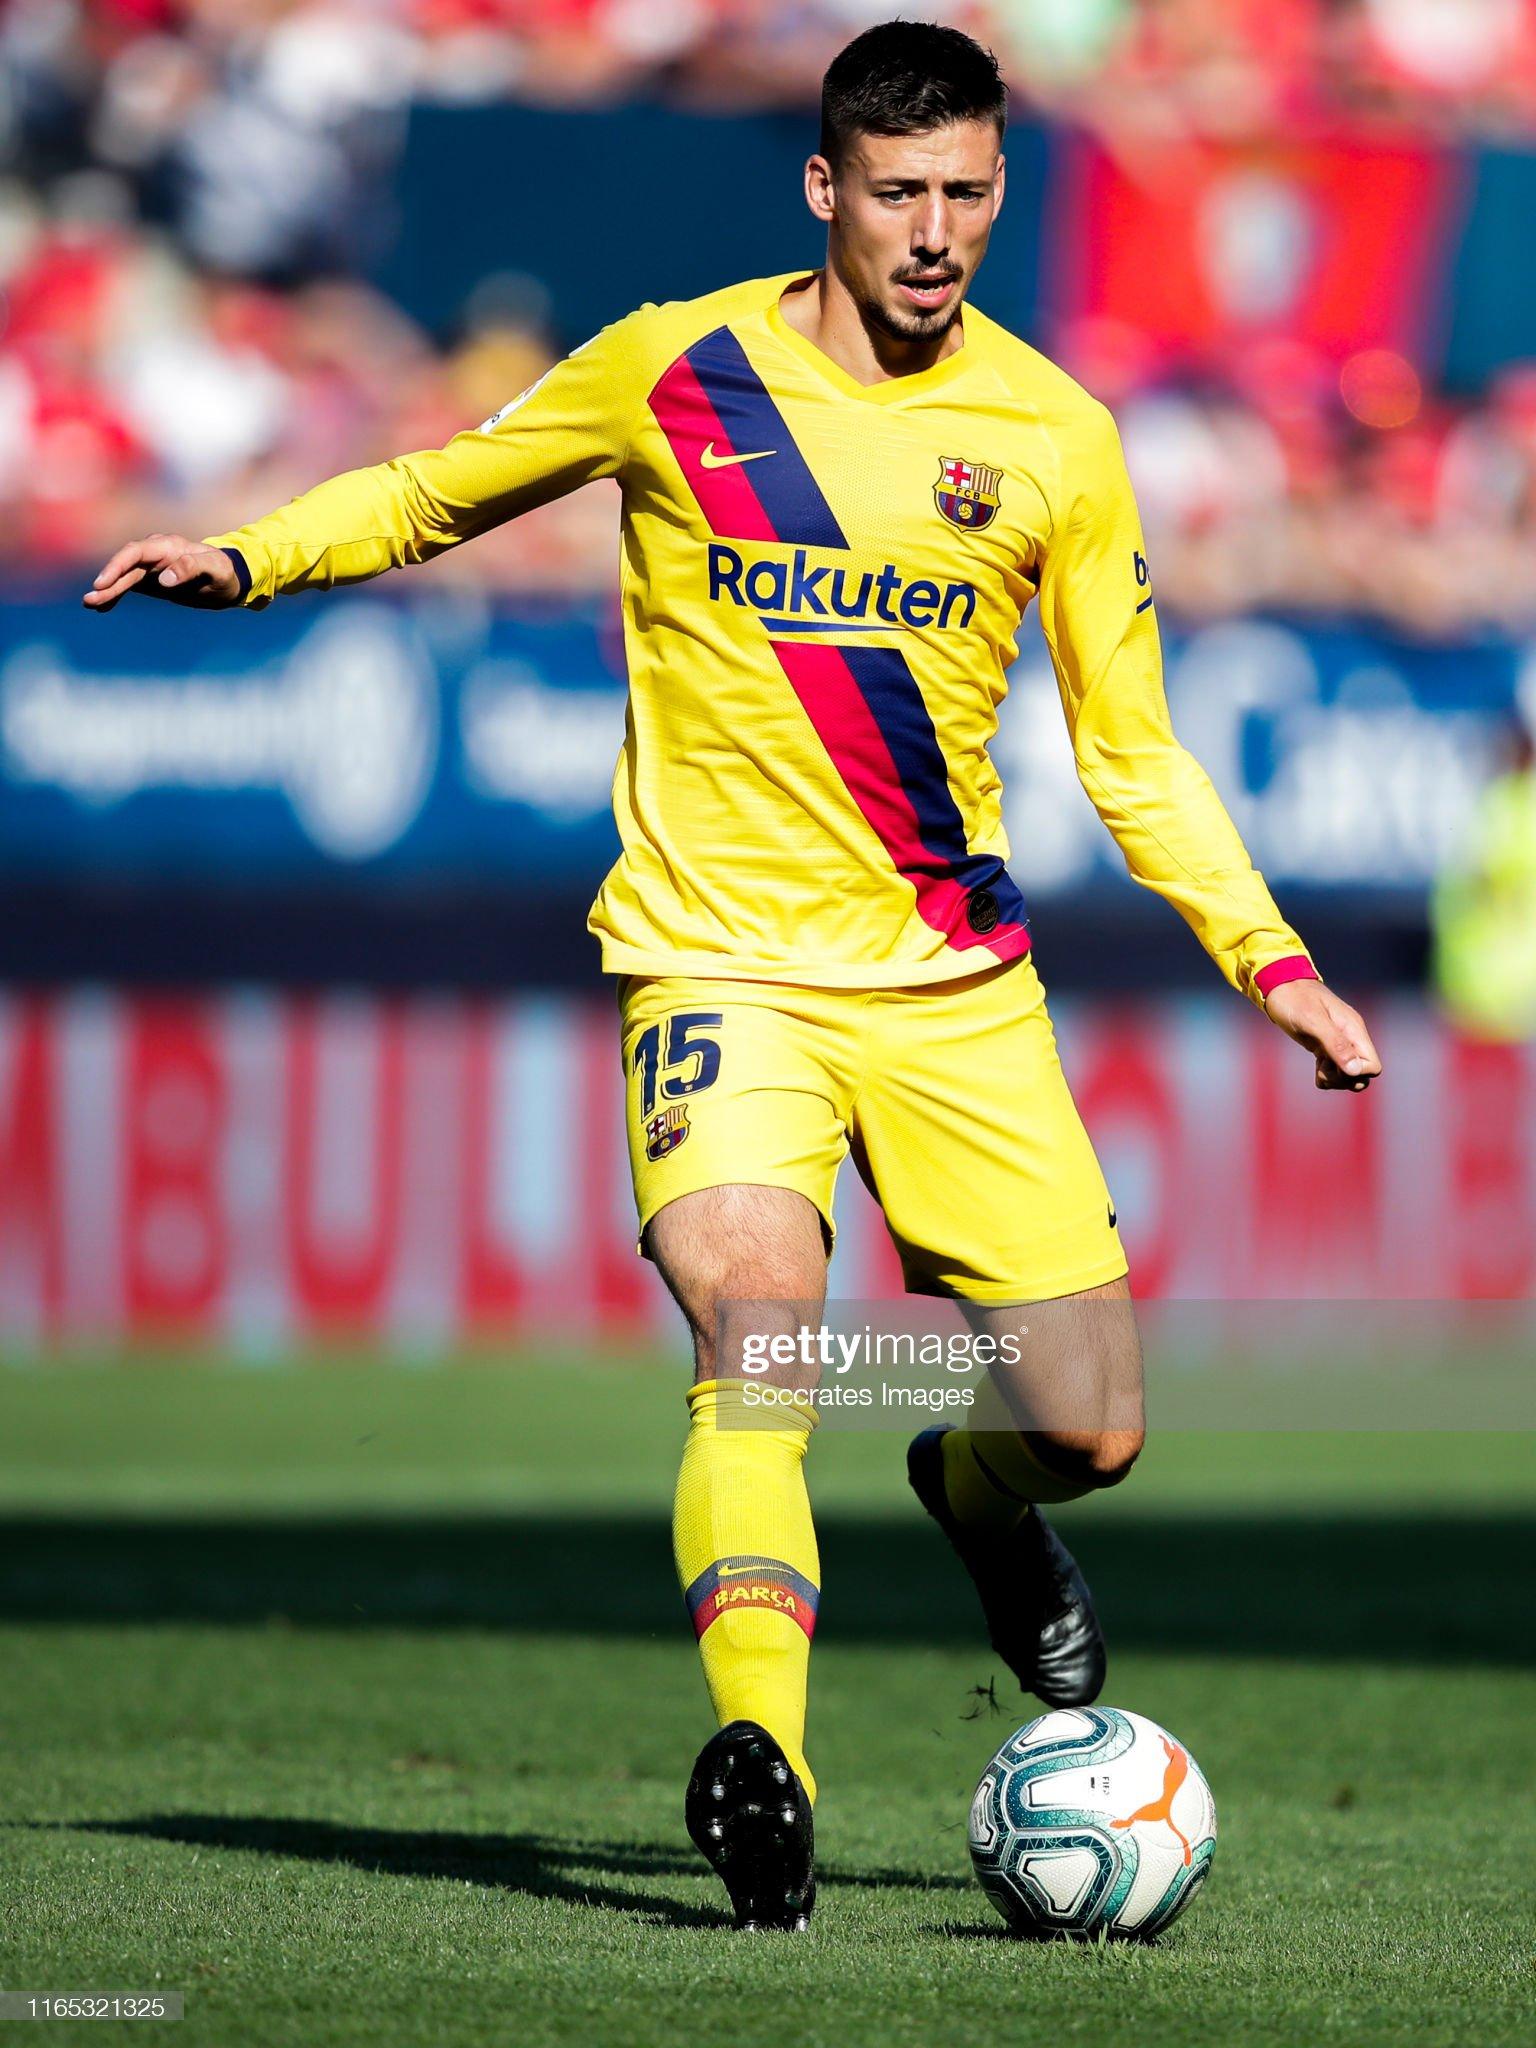 صور مباراة : أوساسونا - برشلونة 2-2 ( 31-08-2019 )  Clement-lenglet-of-fc-barcelona-during-the-la-liga-santander-match-picture-id1165321325?s=2048x2048